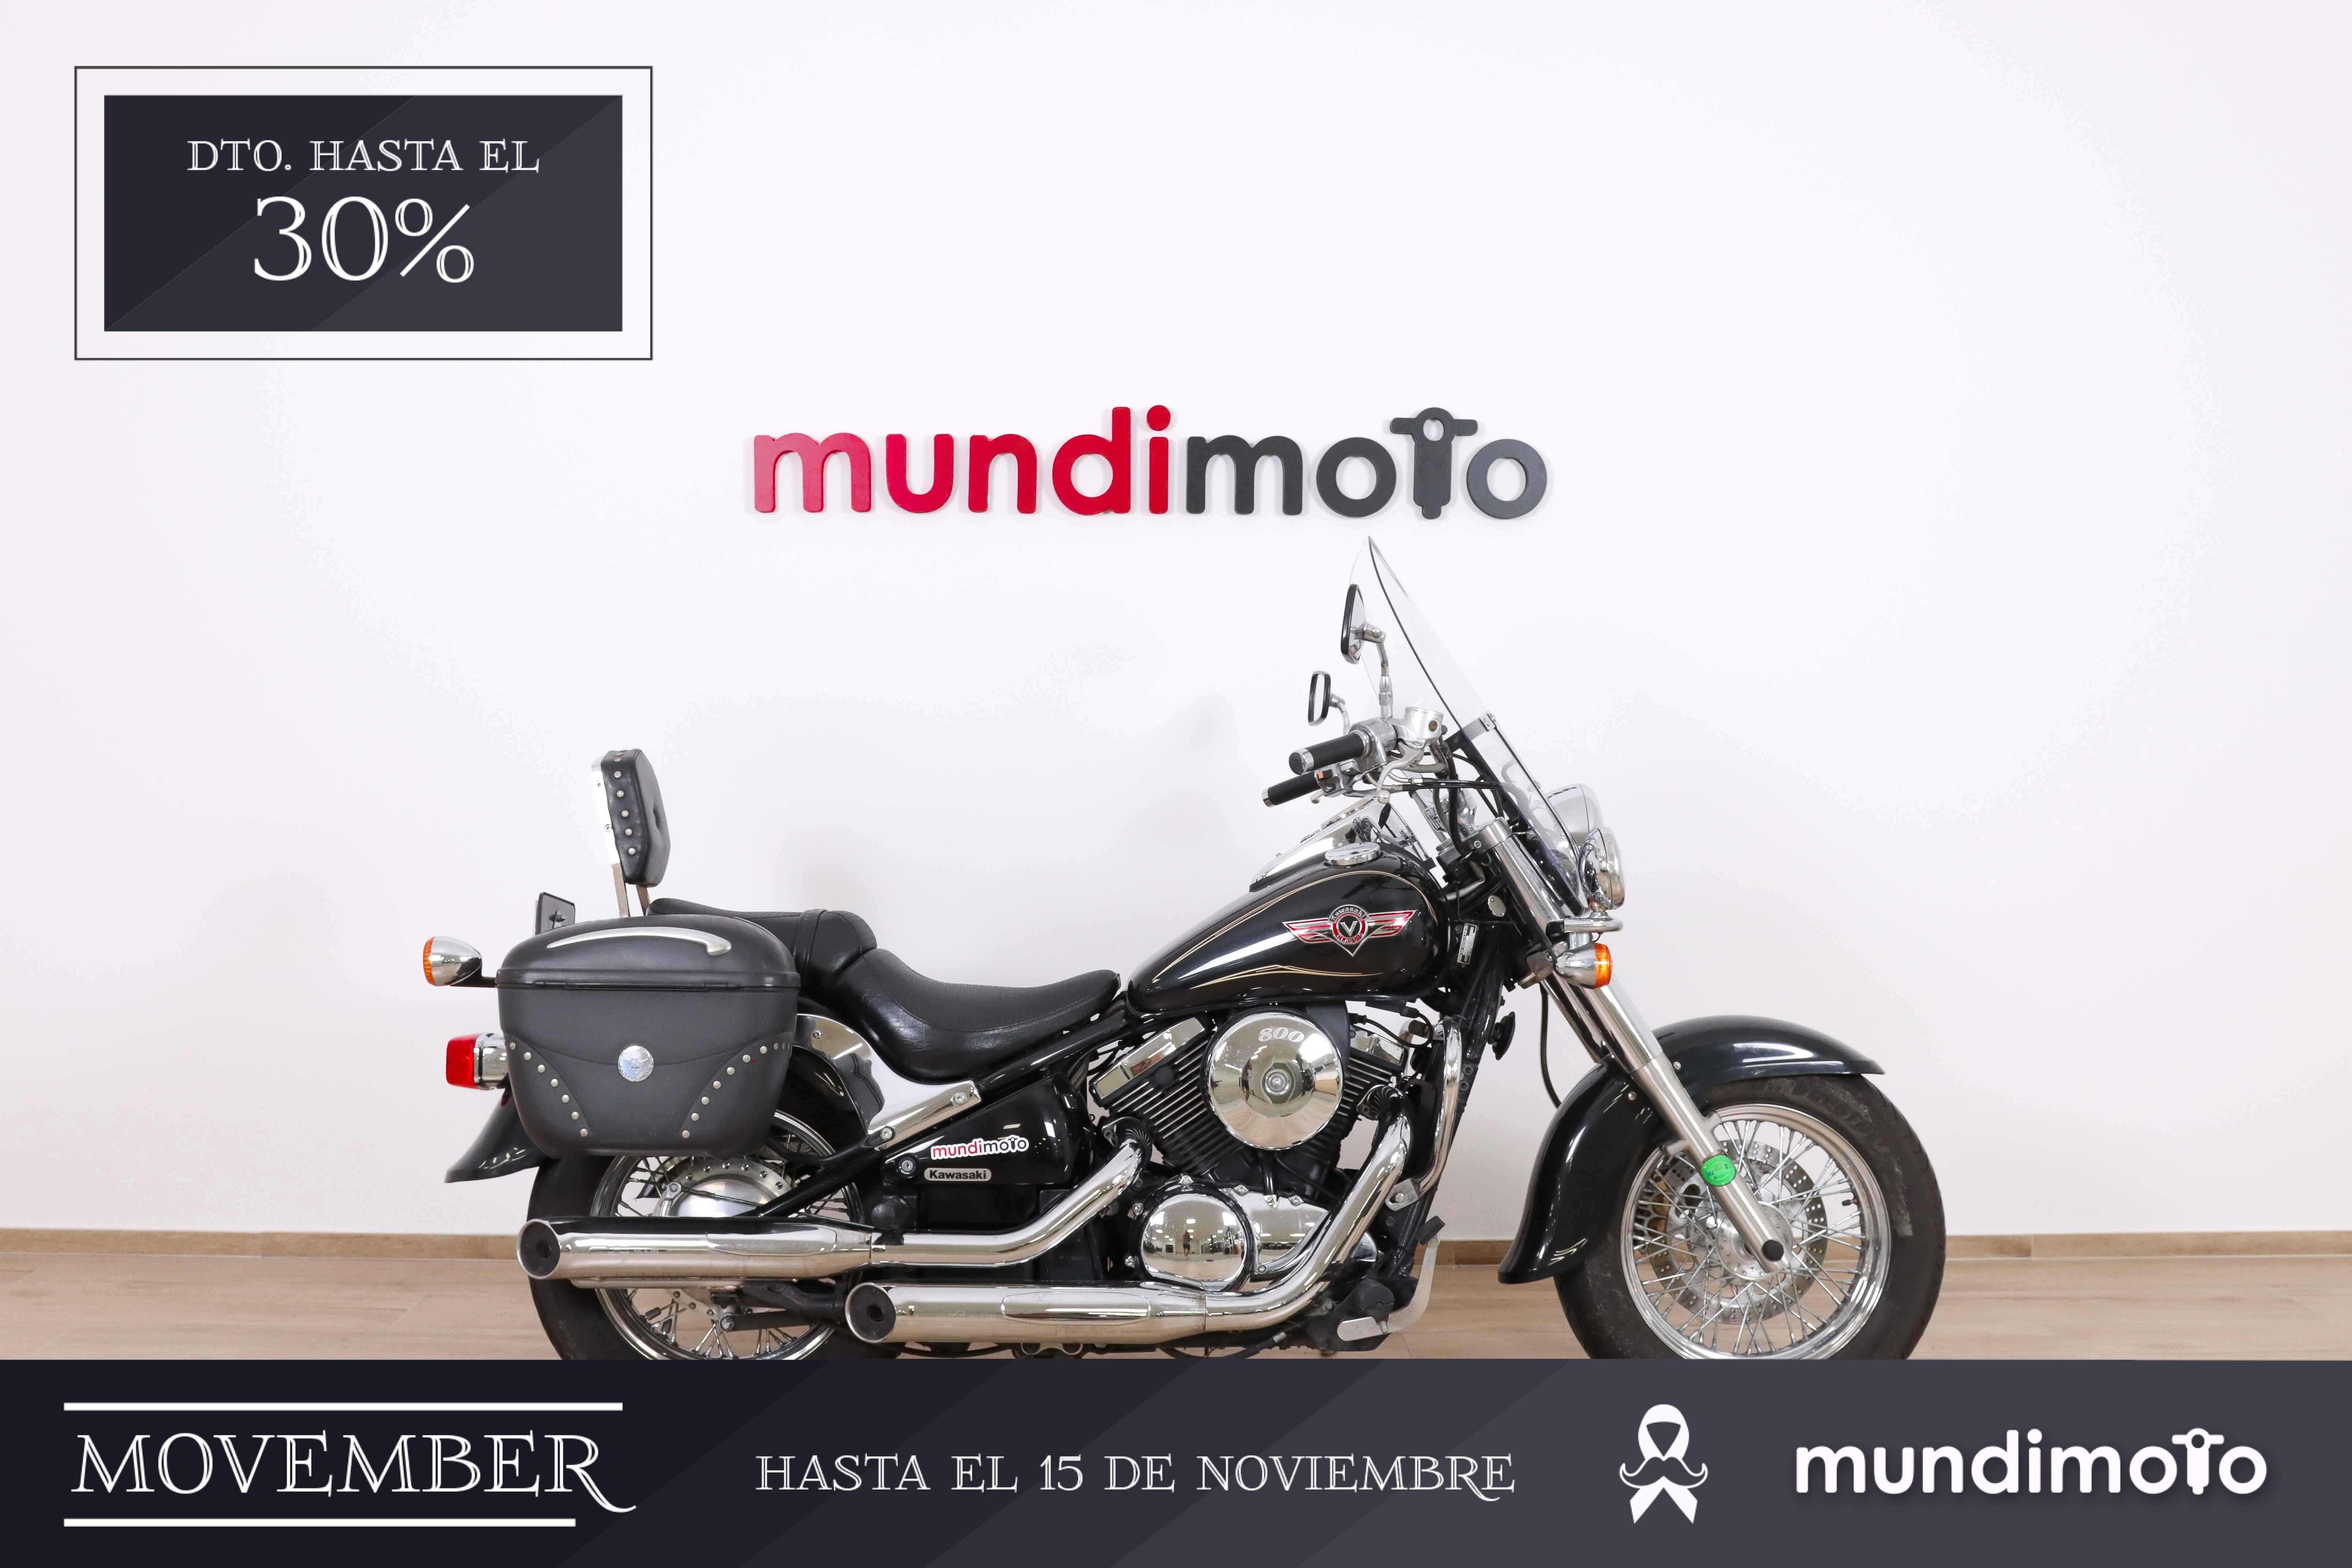 motorbike-image